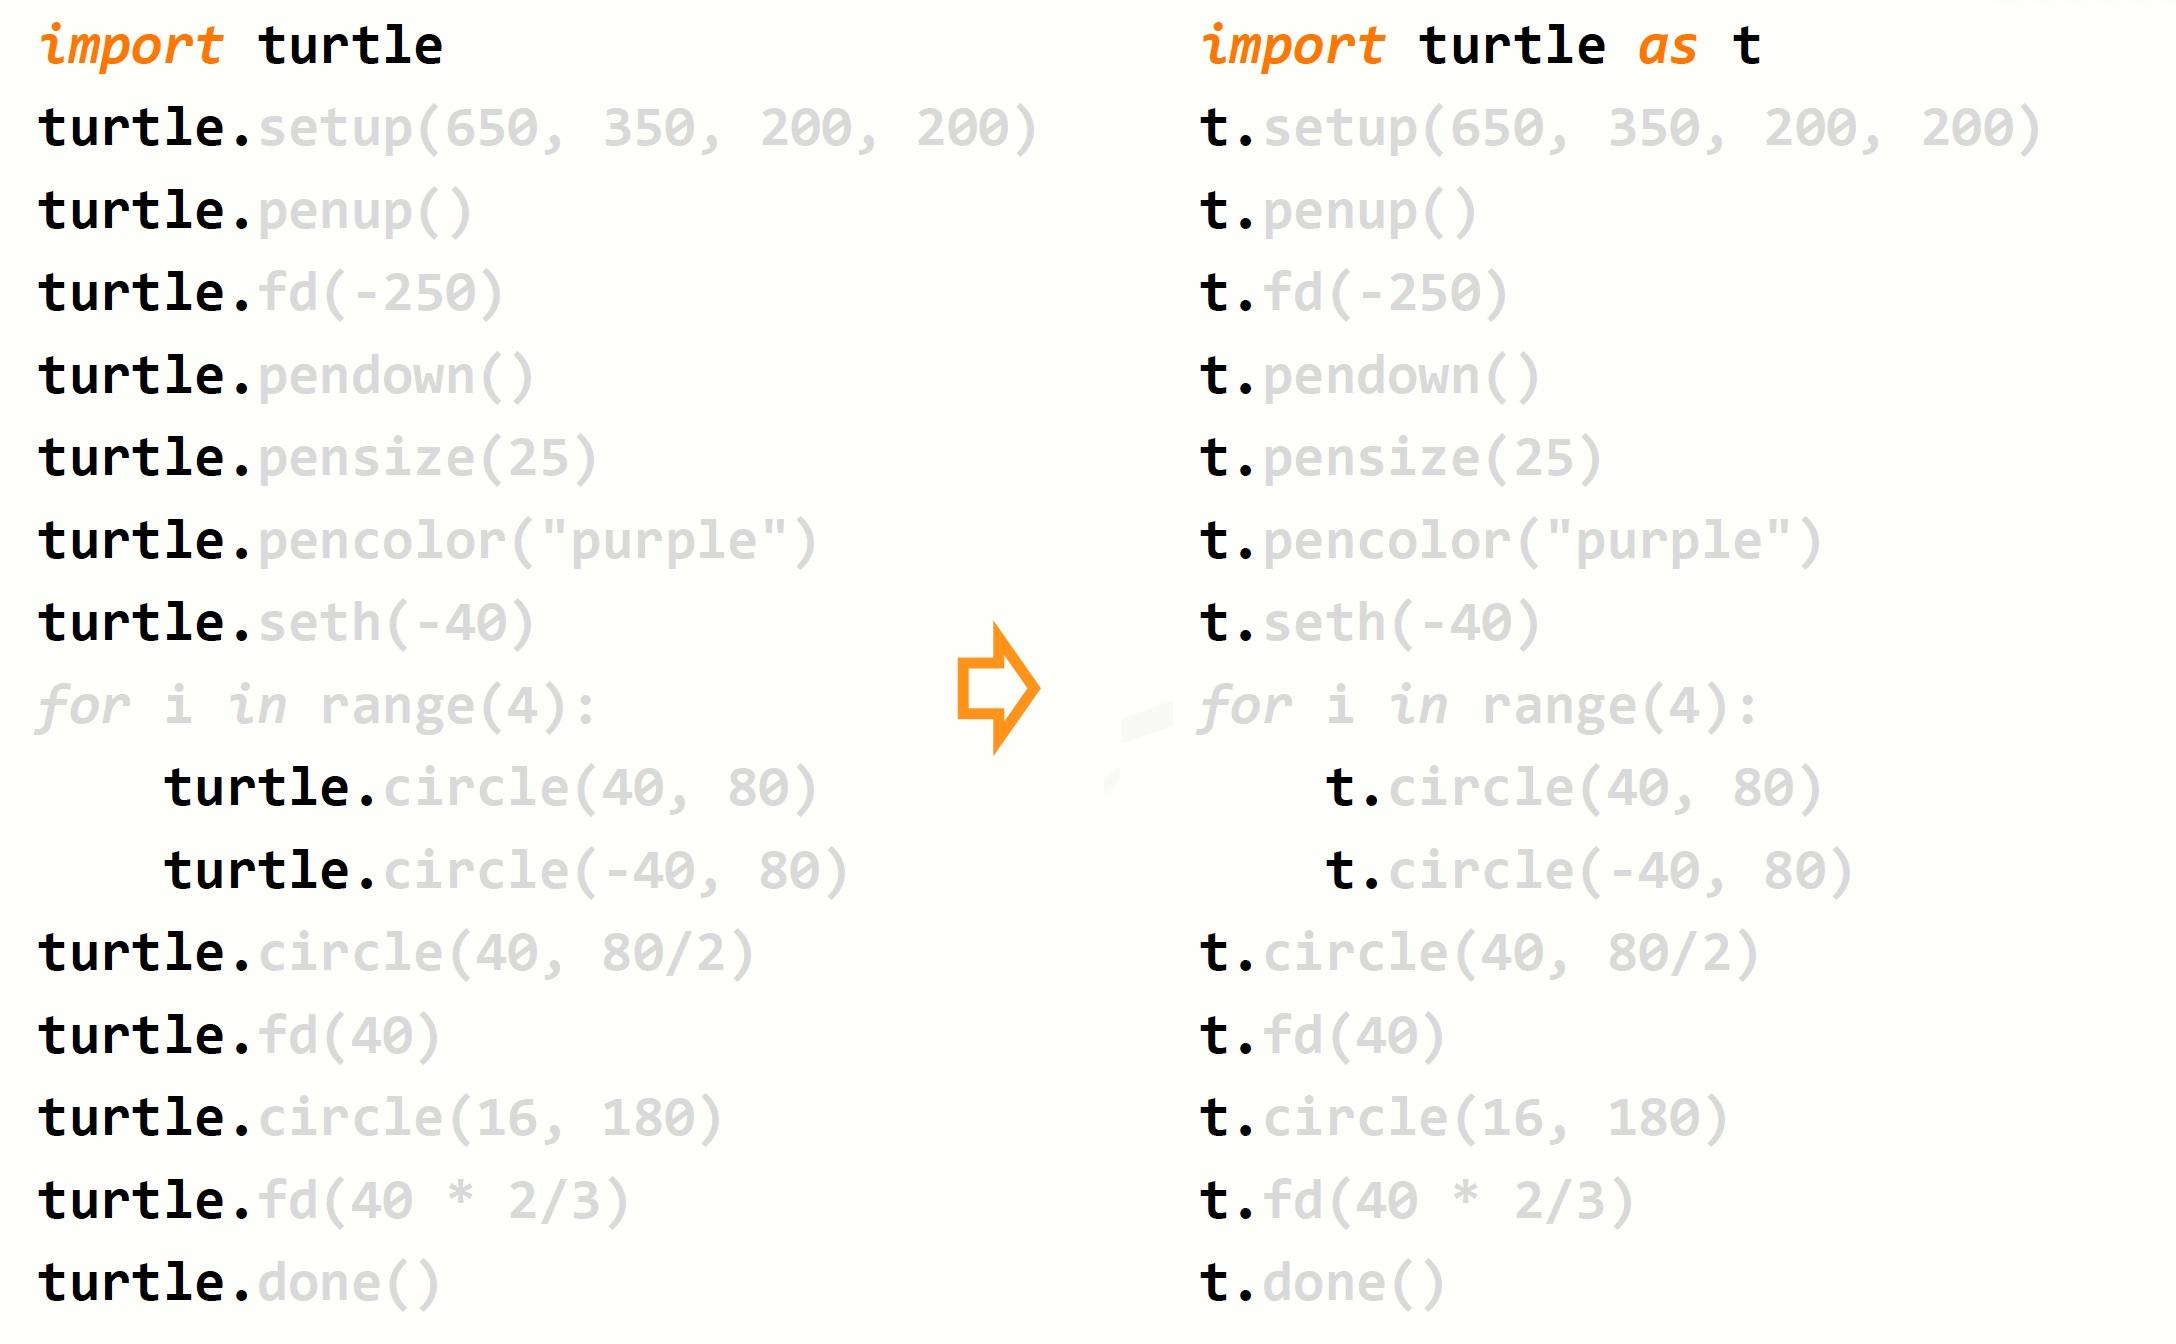 013-turtle程序语法元素分析-03.jpg?x-oss-process=style/watermark